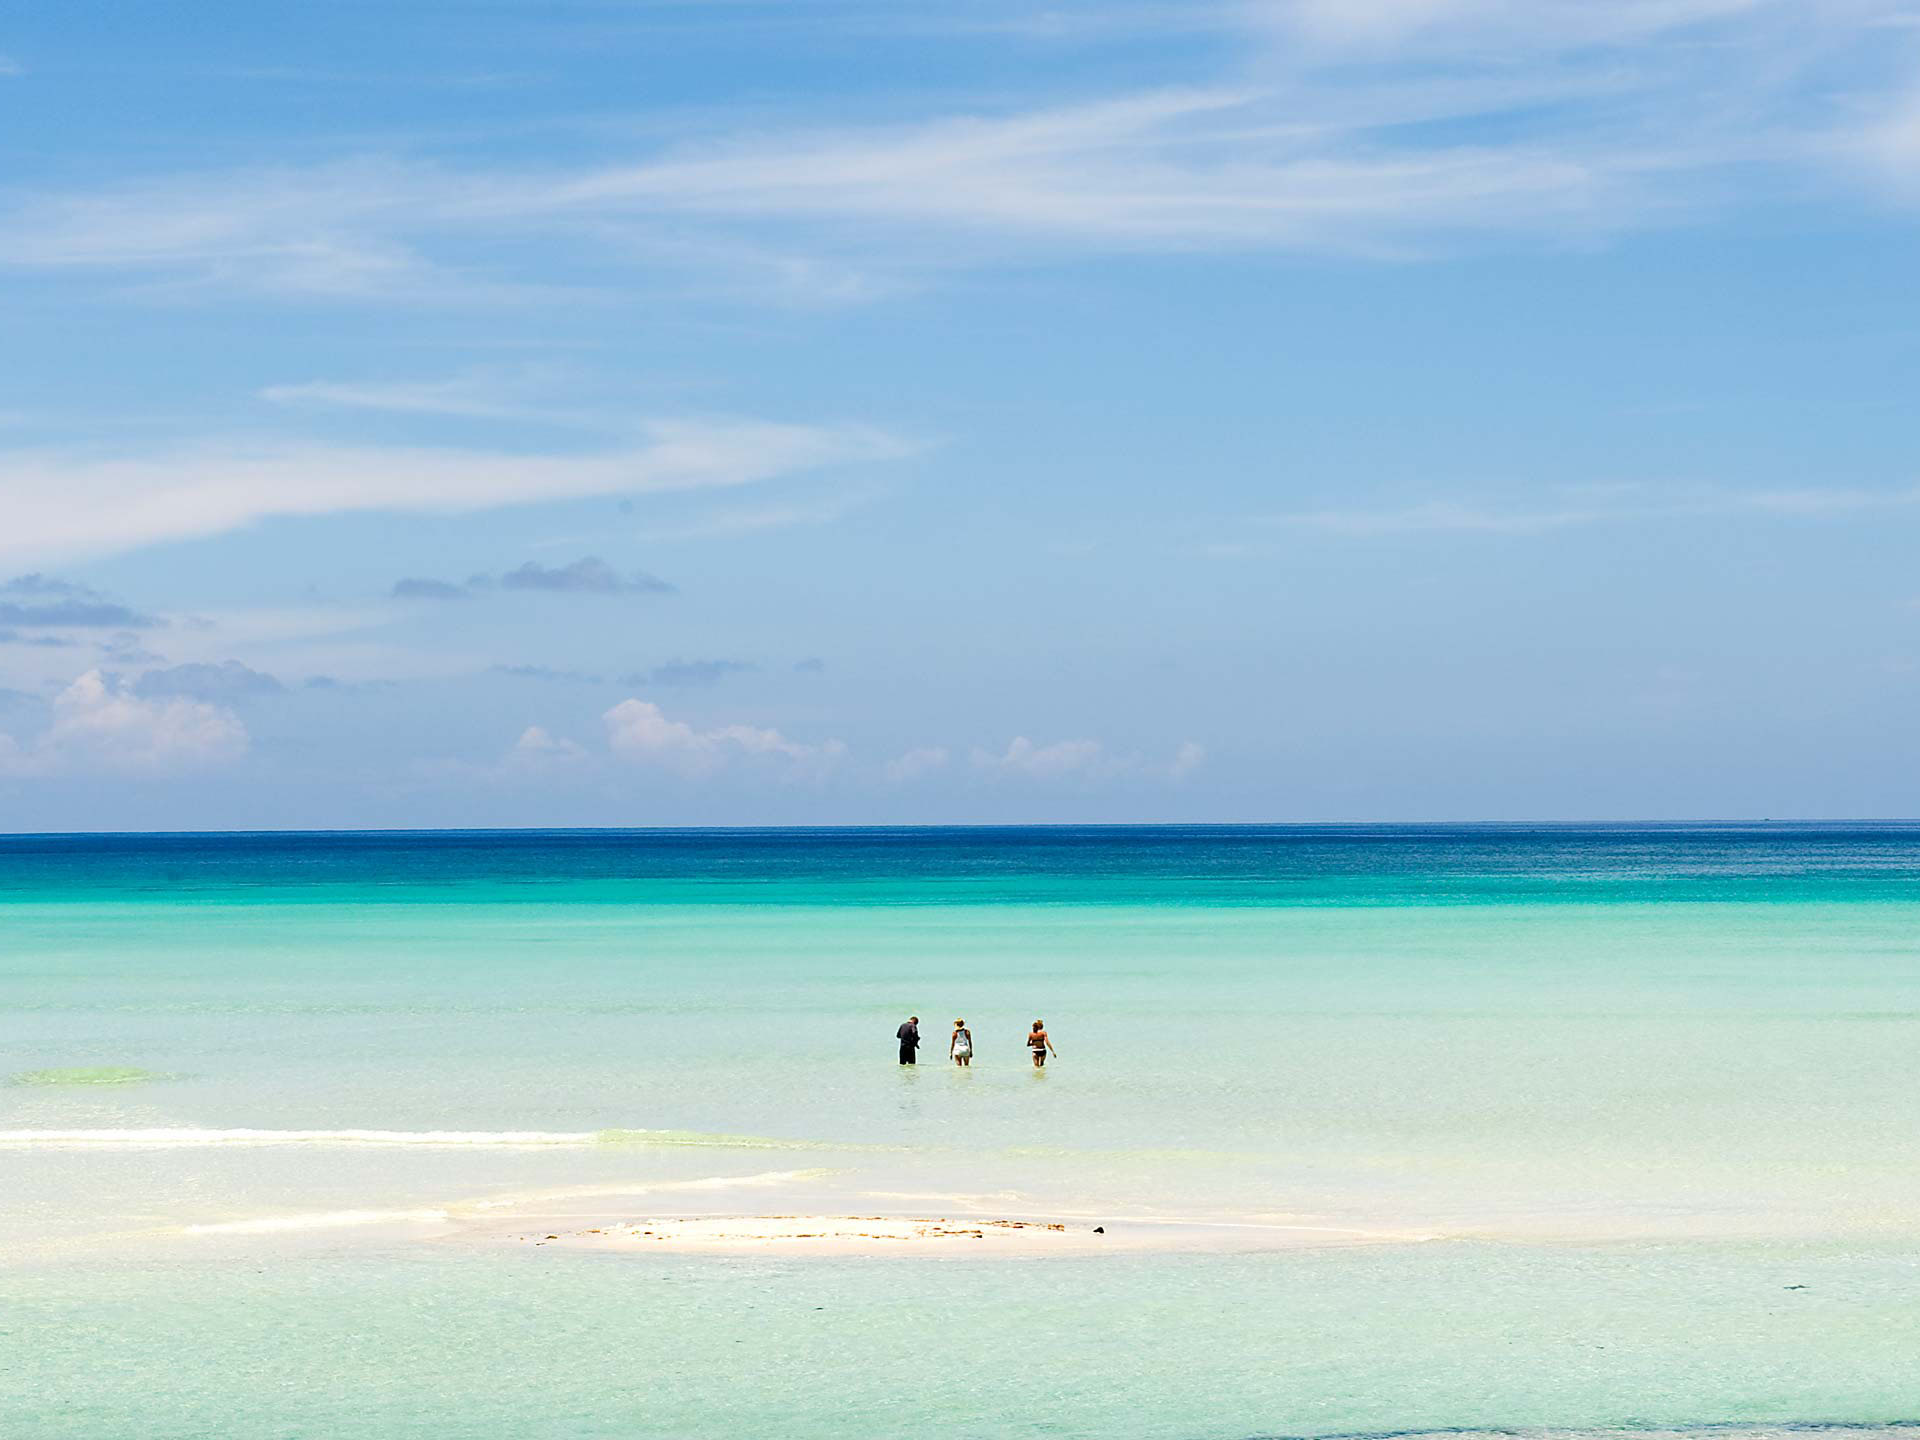 Strand- und Badeuraub